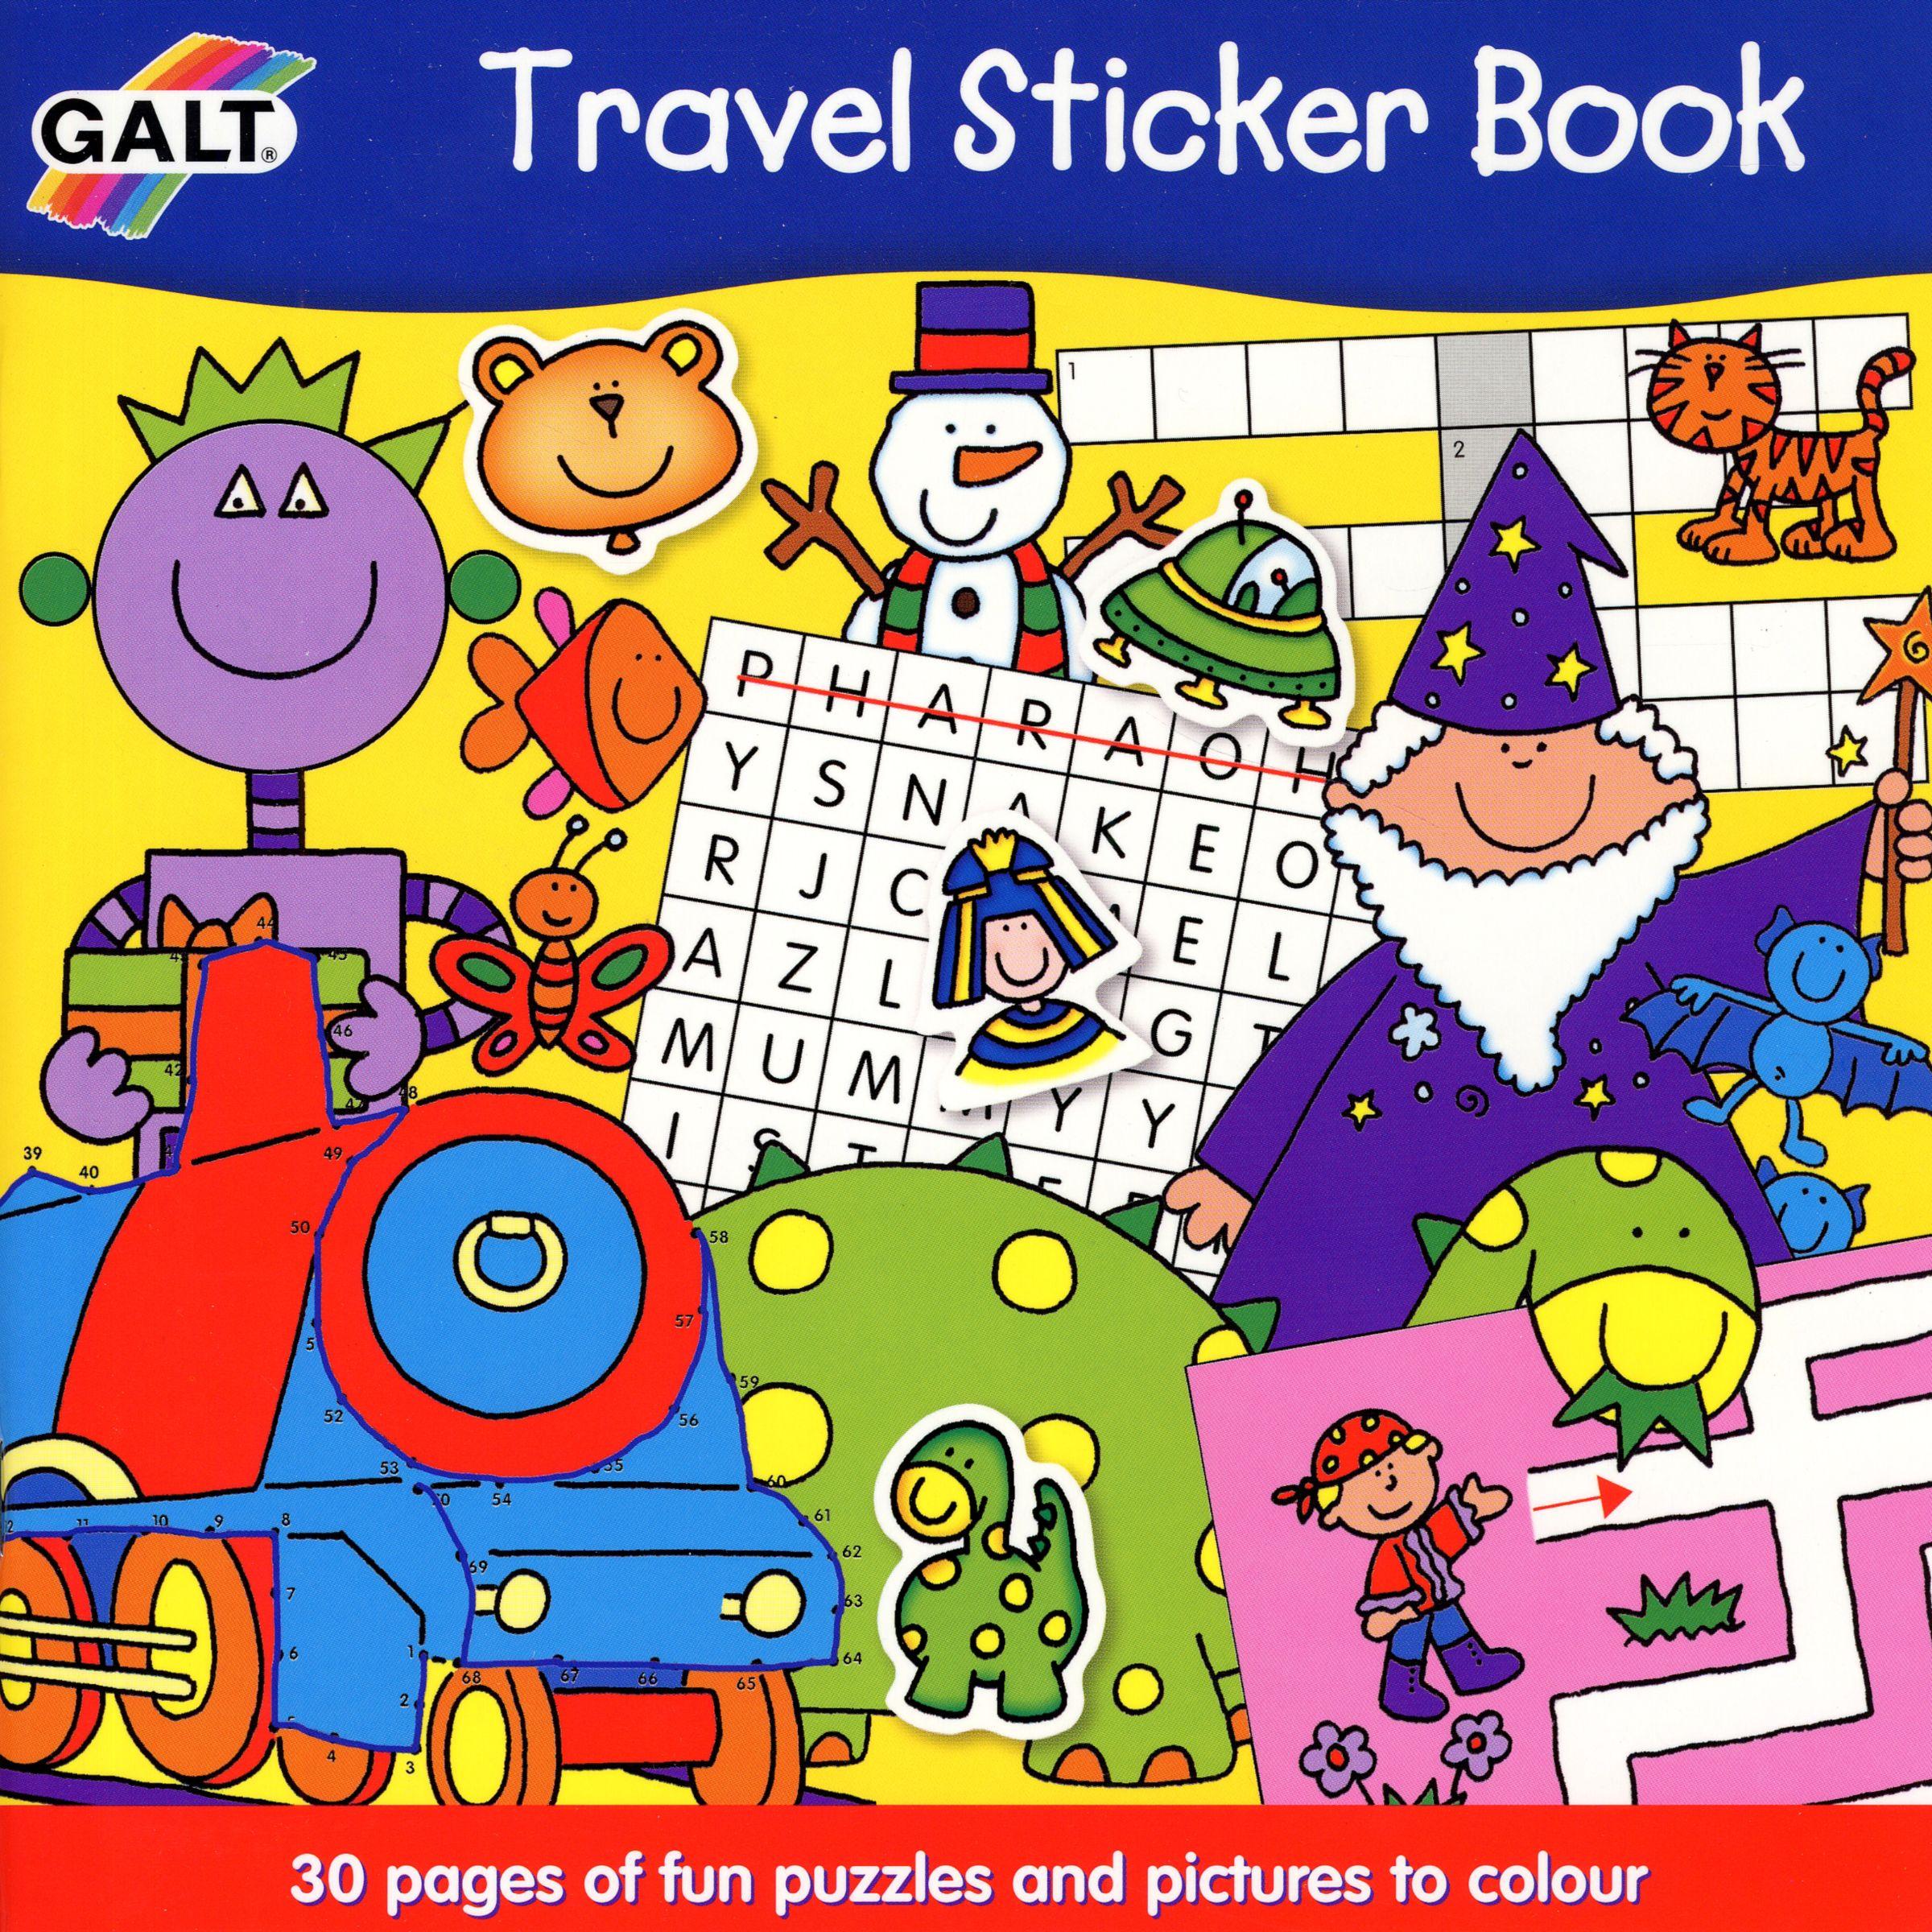 Groves Galt Travel Sticker Book